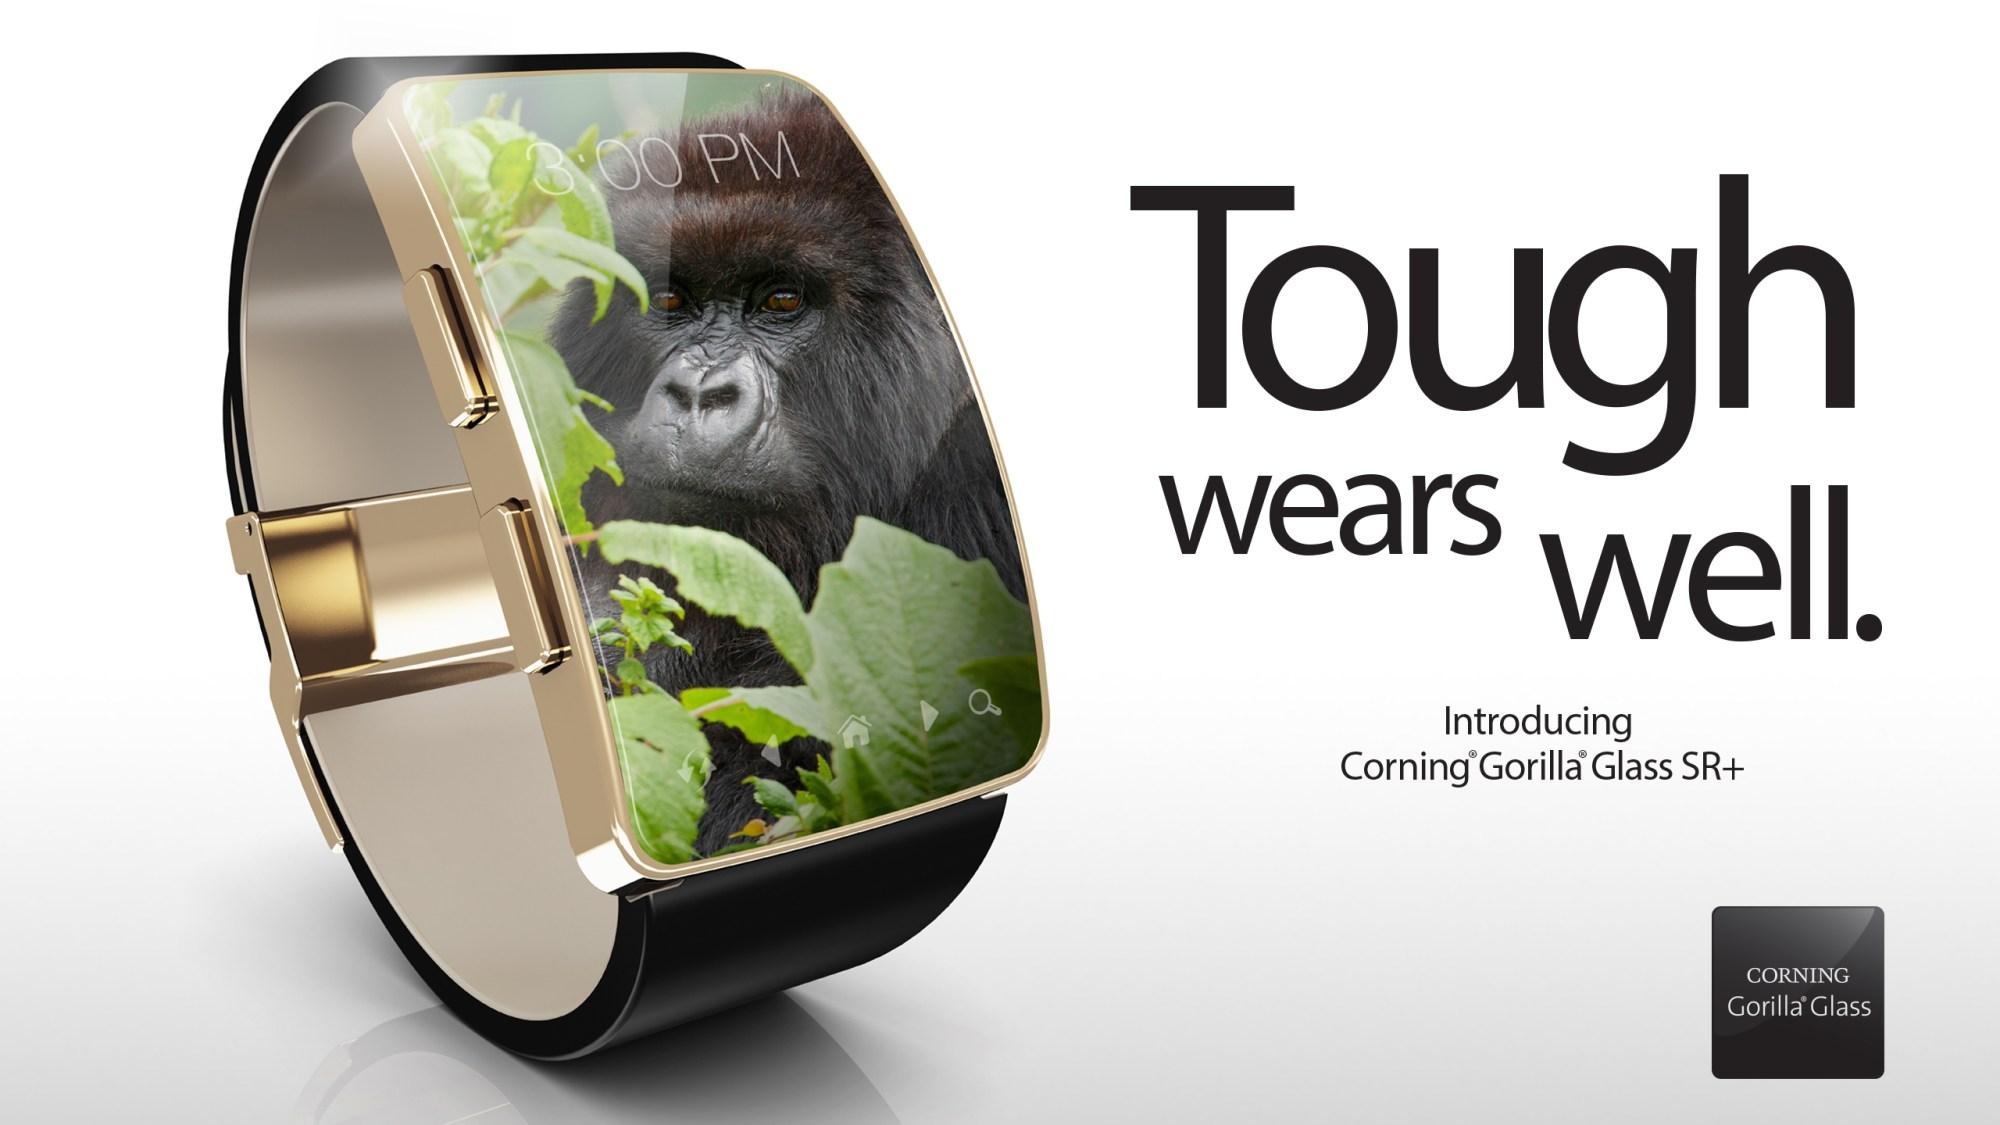 康寧推出Corning® Gorilla® Glass SR+ (橫式)